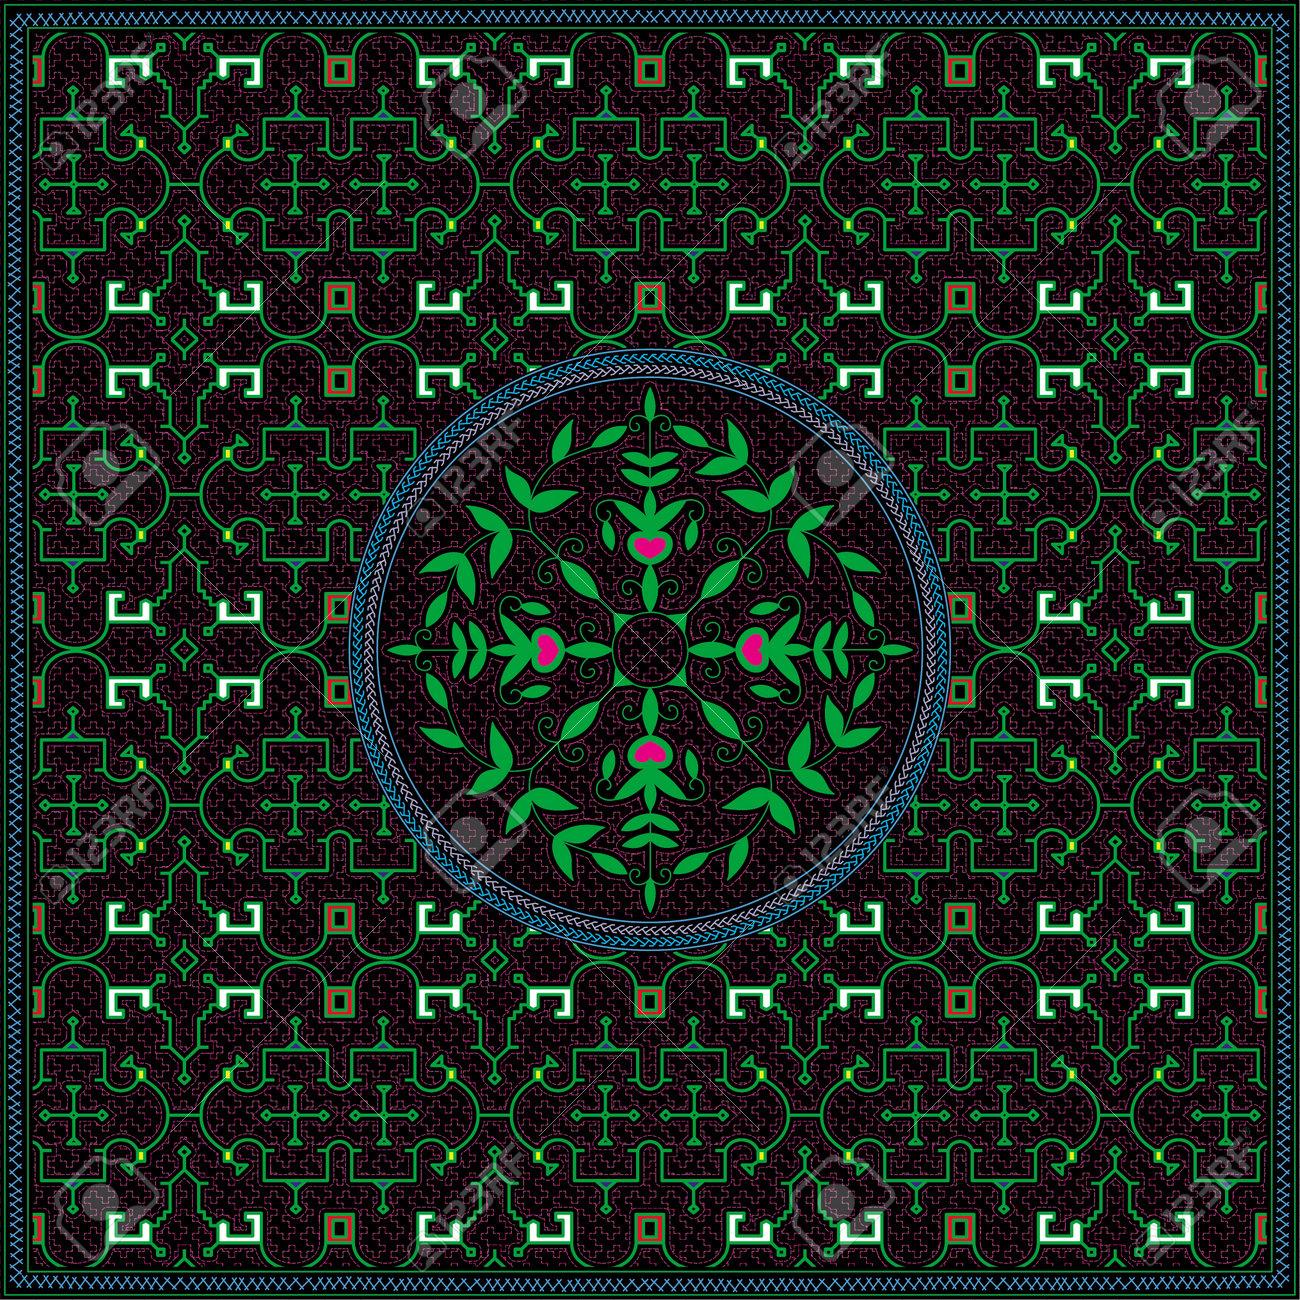 1 of 12 Shipibo Conibo artwork patterns HD set - 160579504